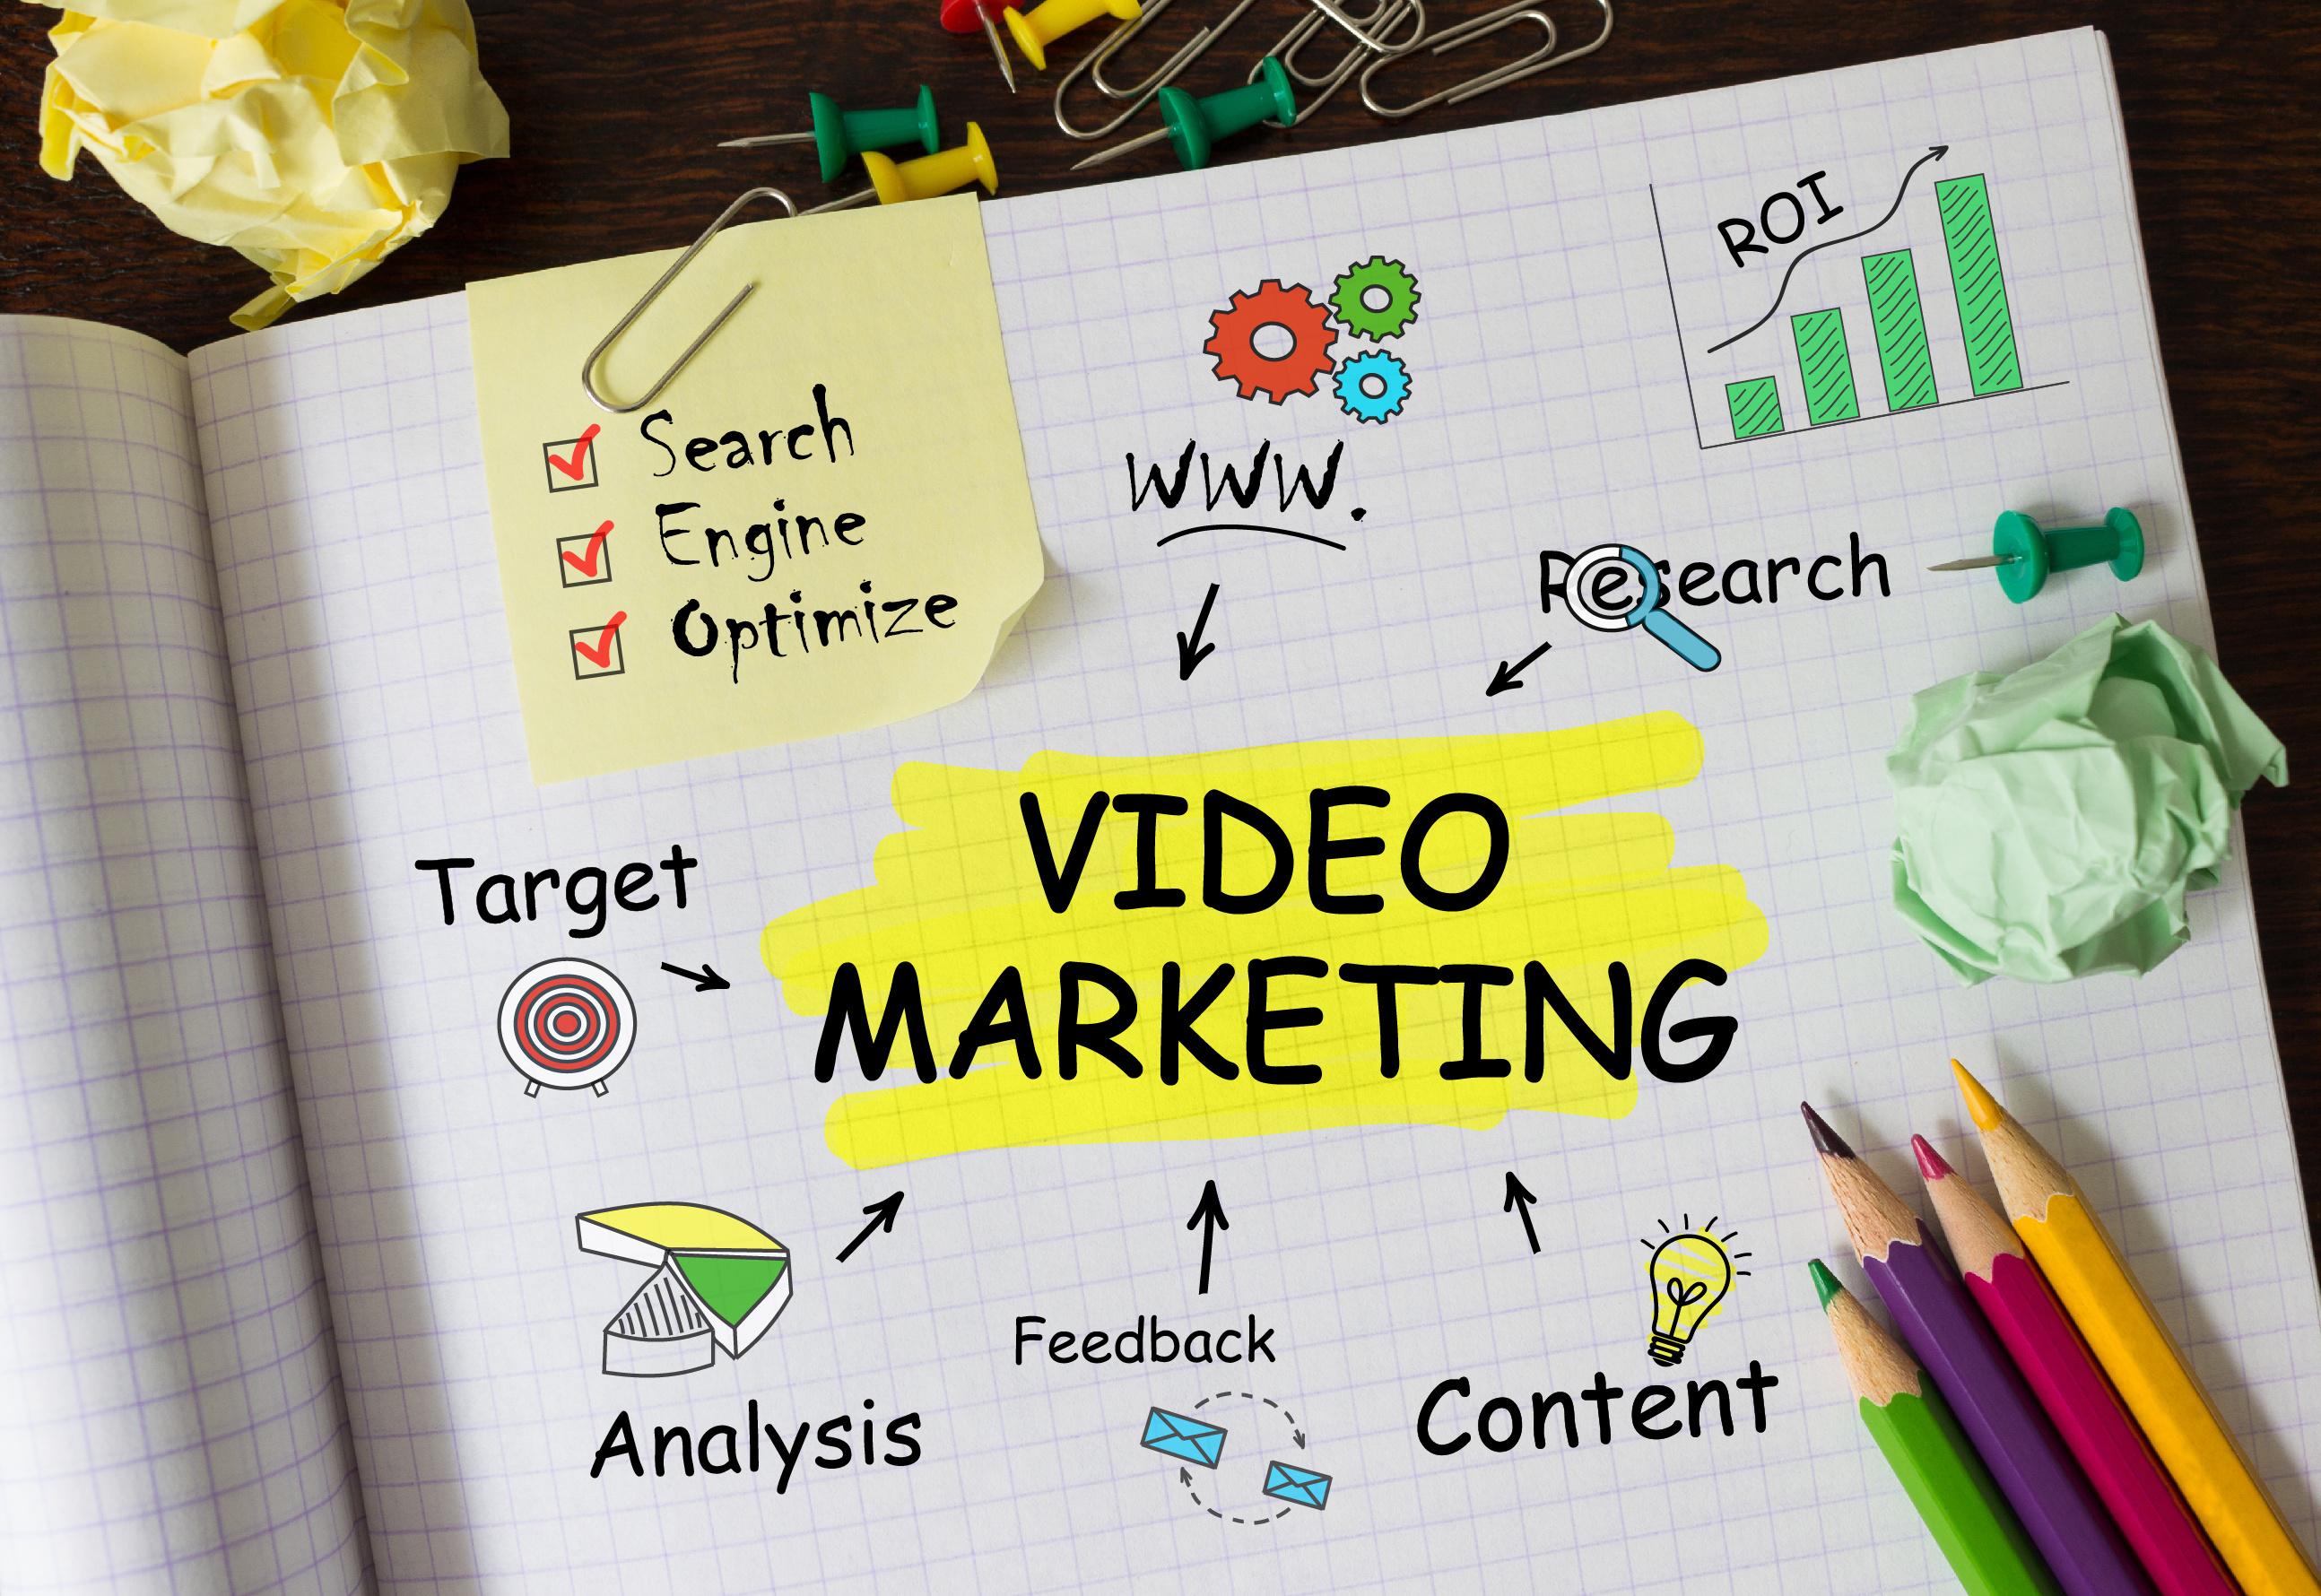 Alternatives to youtube video marketing